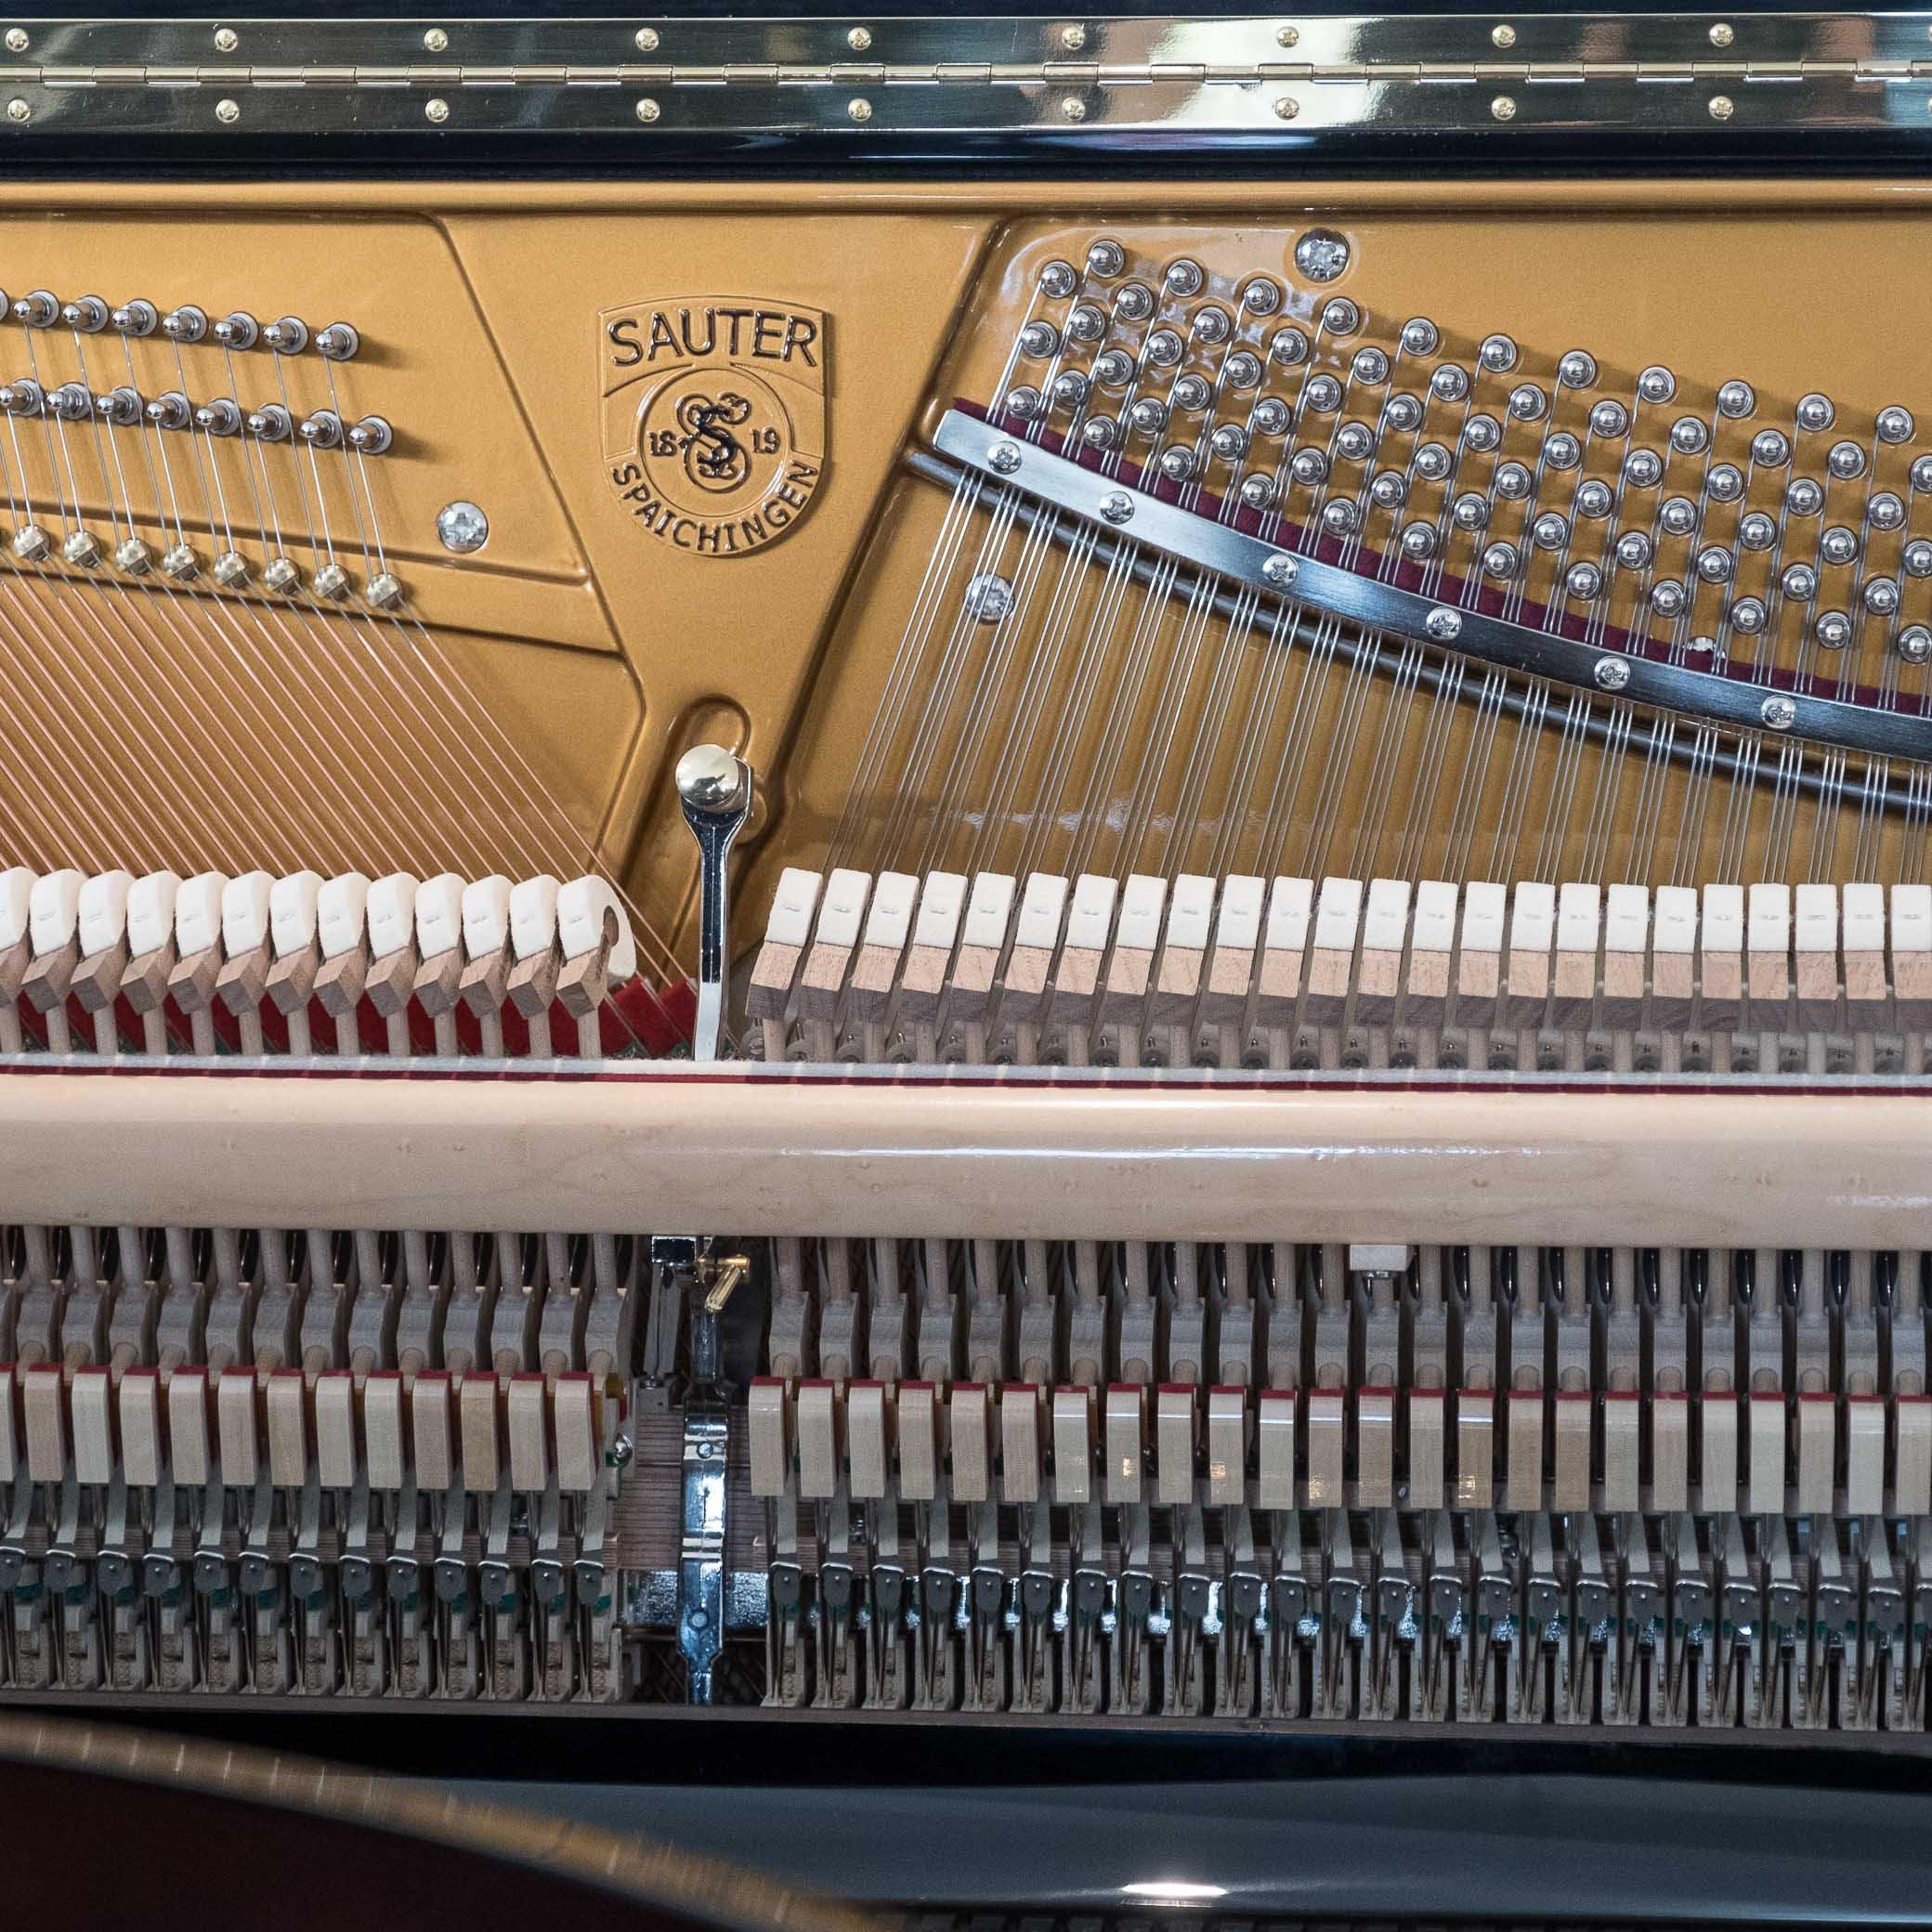 New Sauter 130 upright piano FXT37139